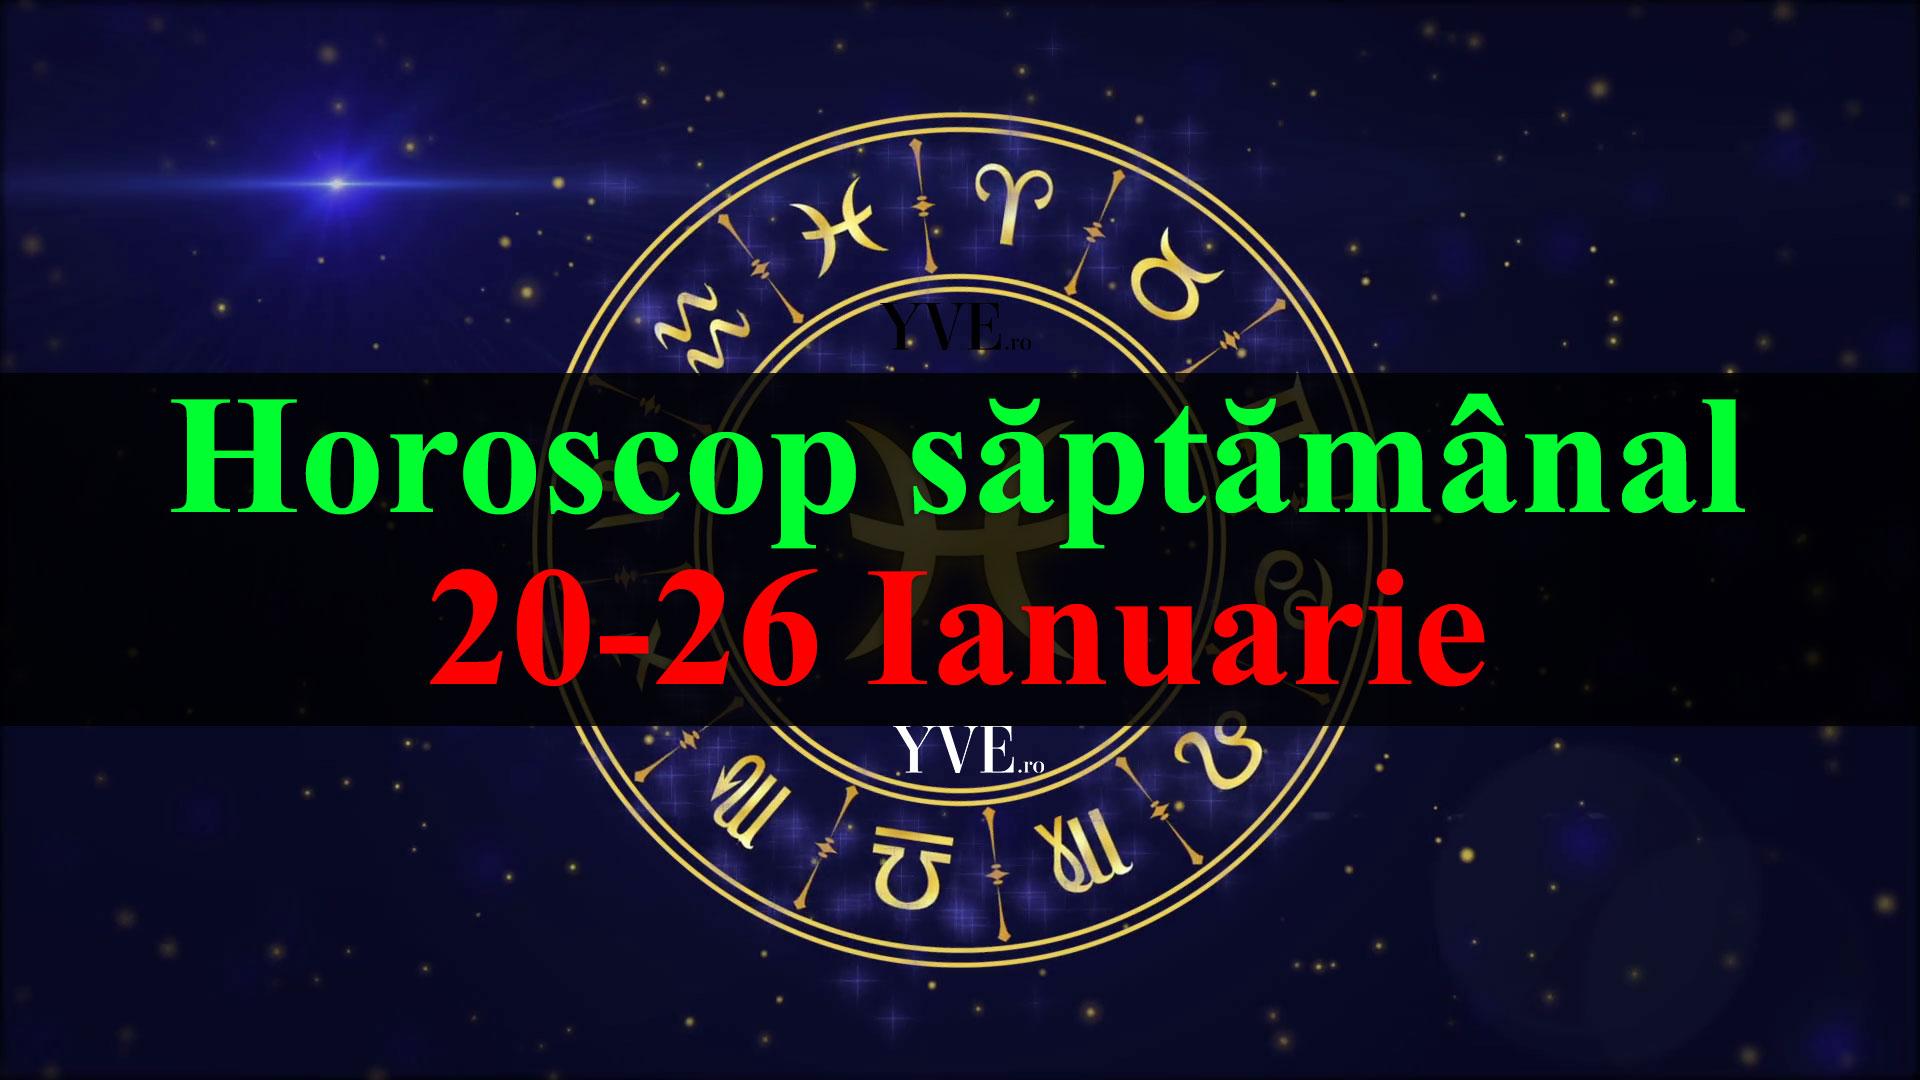 Horoscop saptamanal 20-26 Ianuarie 2020